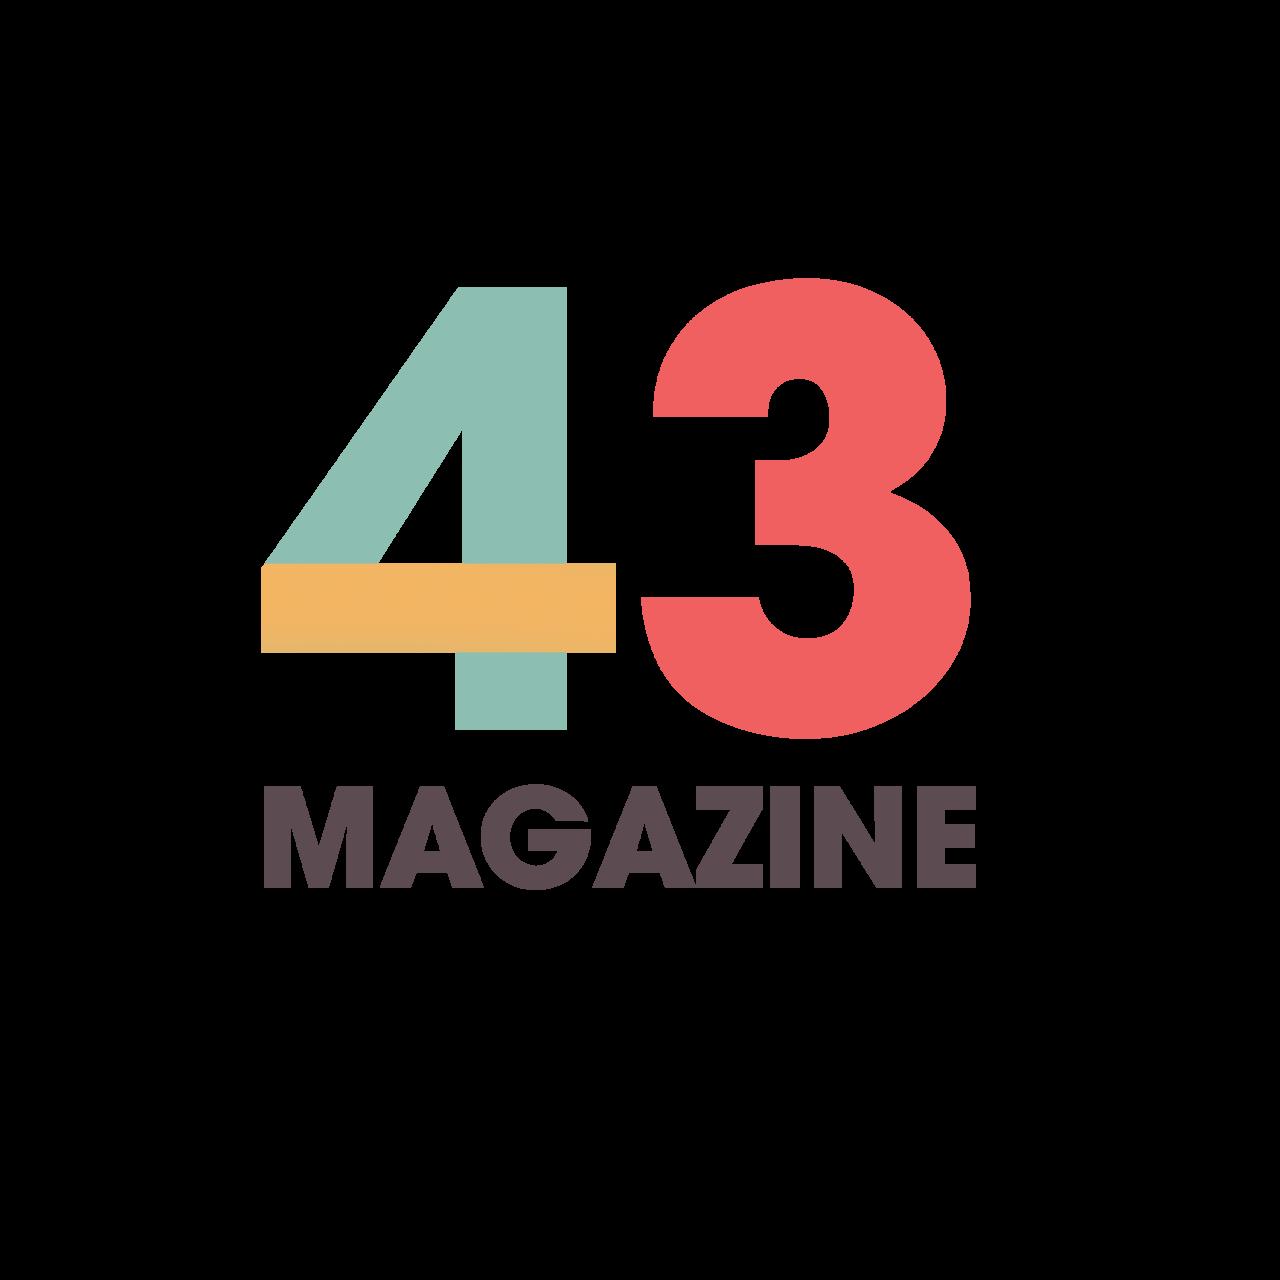 Magazine 43